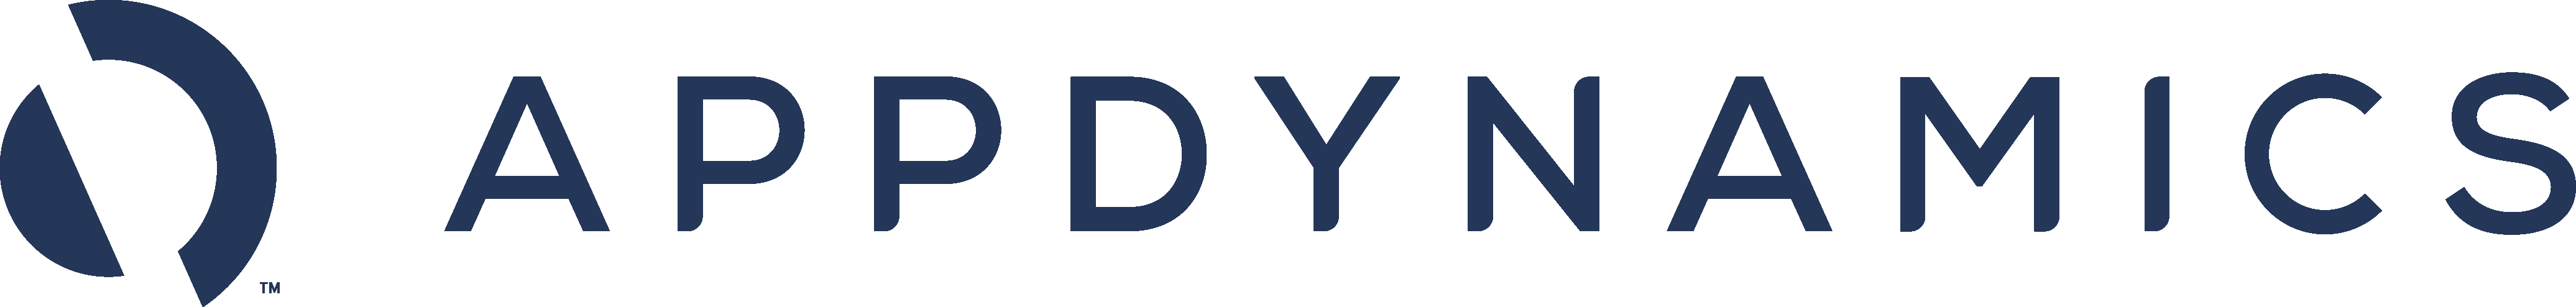 Appdynamics のロゴ